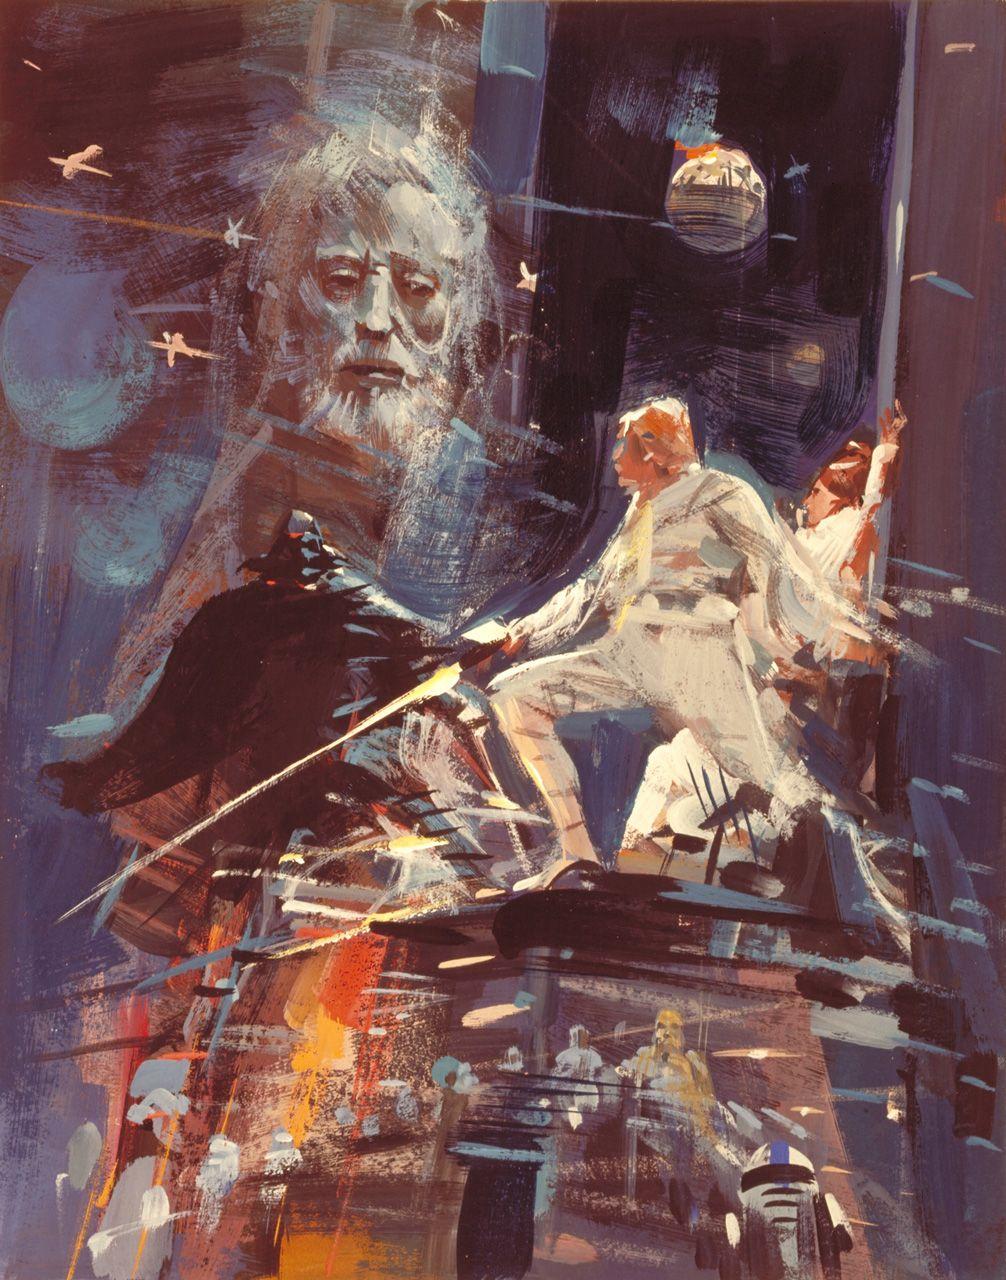 I Love The Original Star Wars Concept Art It S Amazing Star Wars Concept Art Star Wars Artwork Star Wars Art